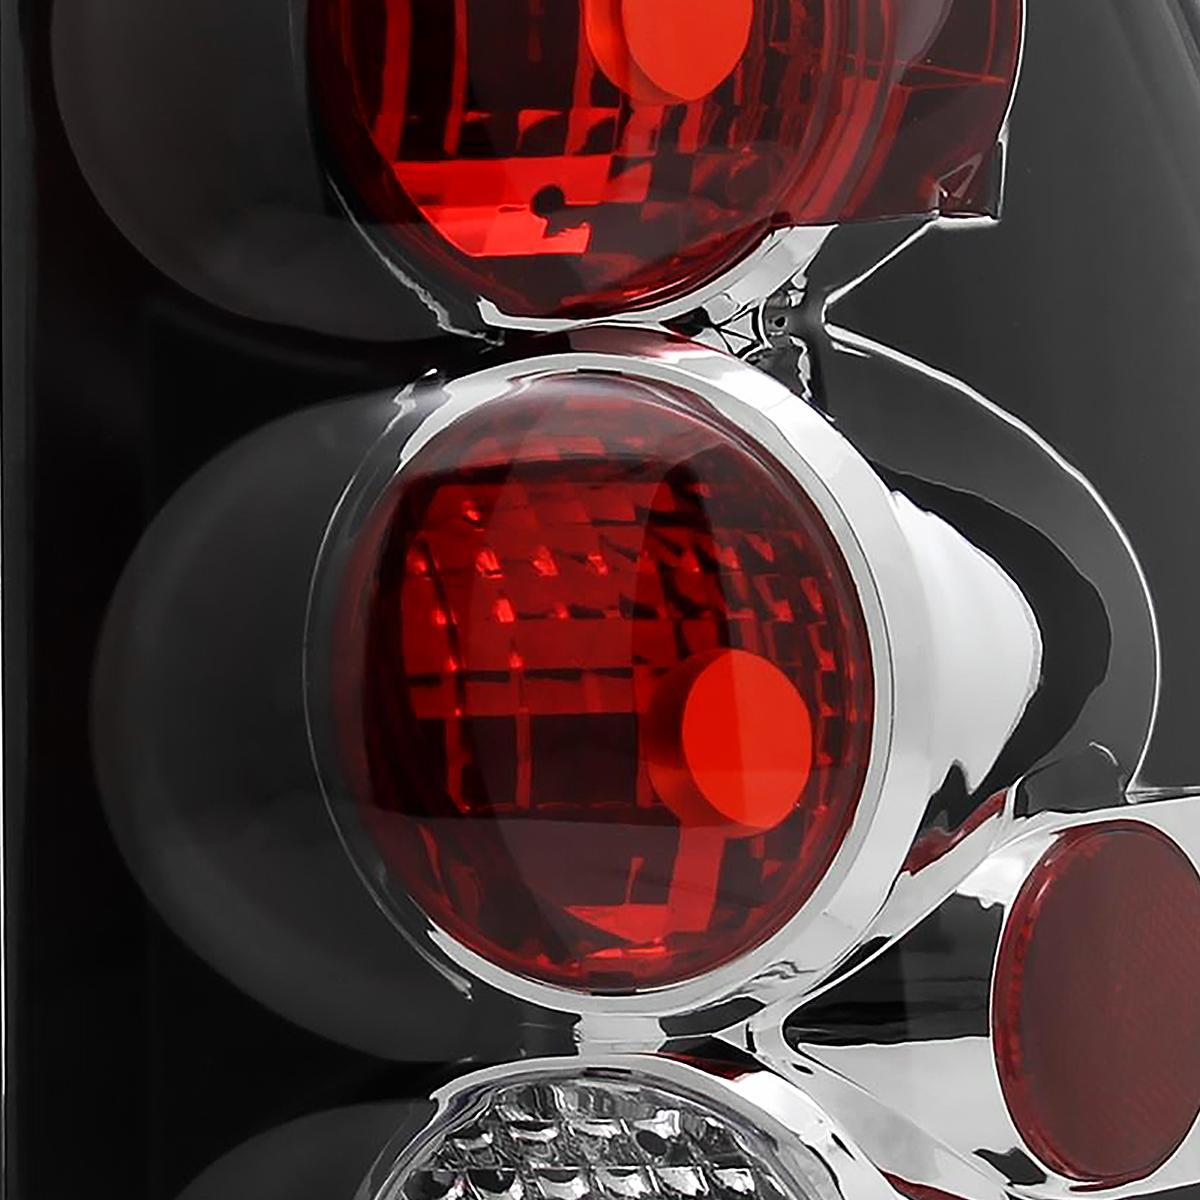 20022009 Chevy Trailblazer Black Tail Lights Brake Lamp